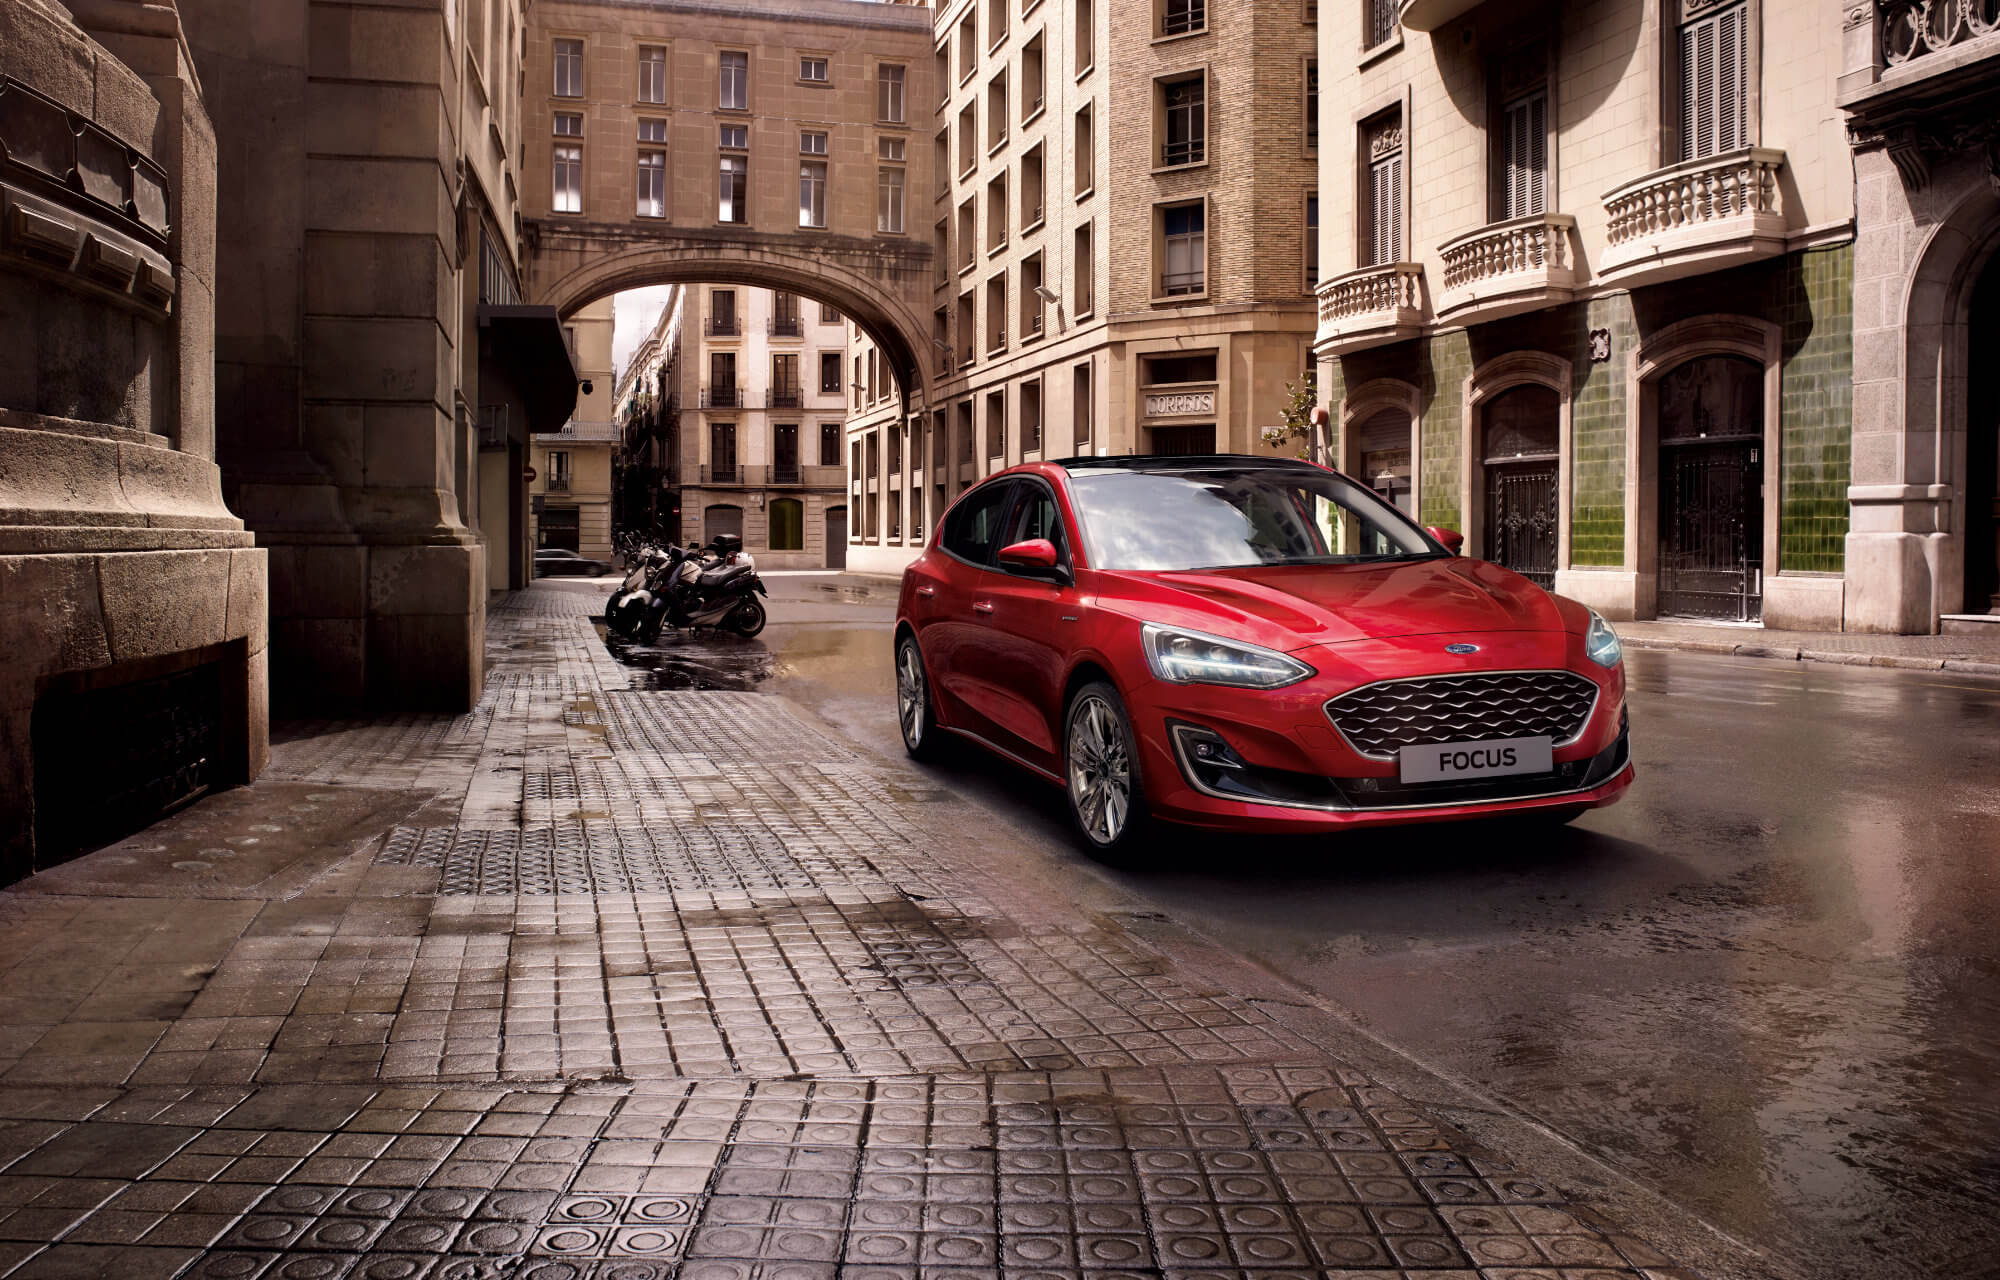 Soutěž o Ford Focus na víkend!